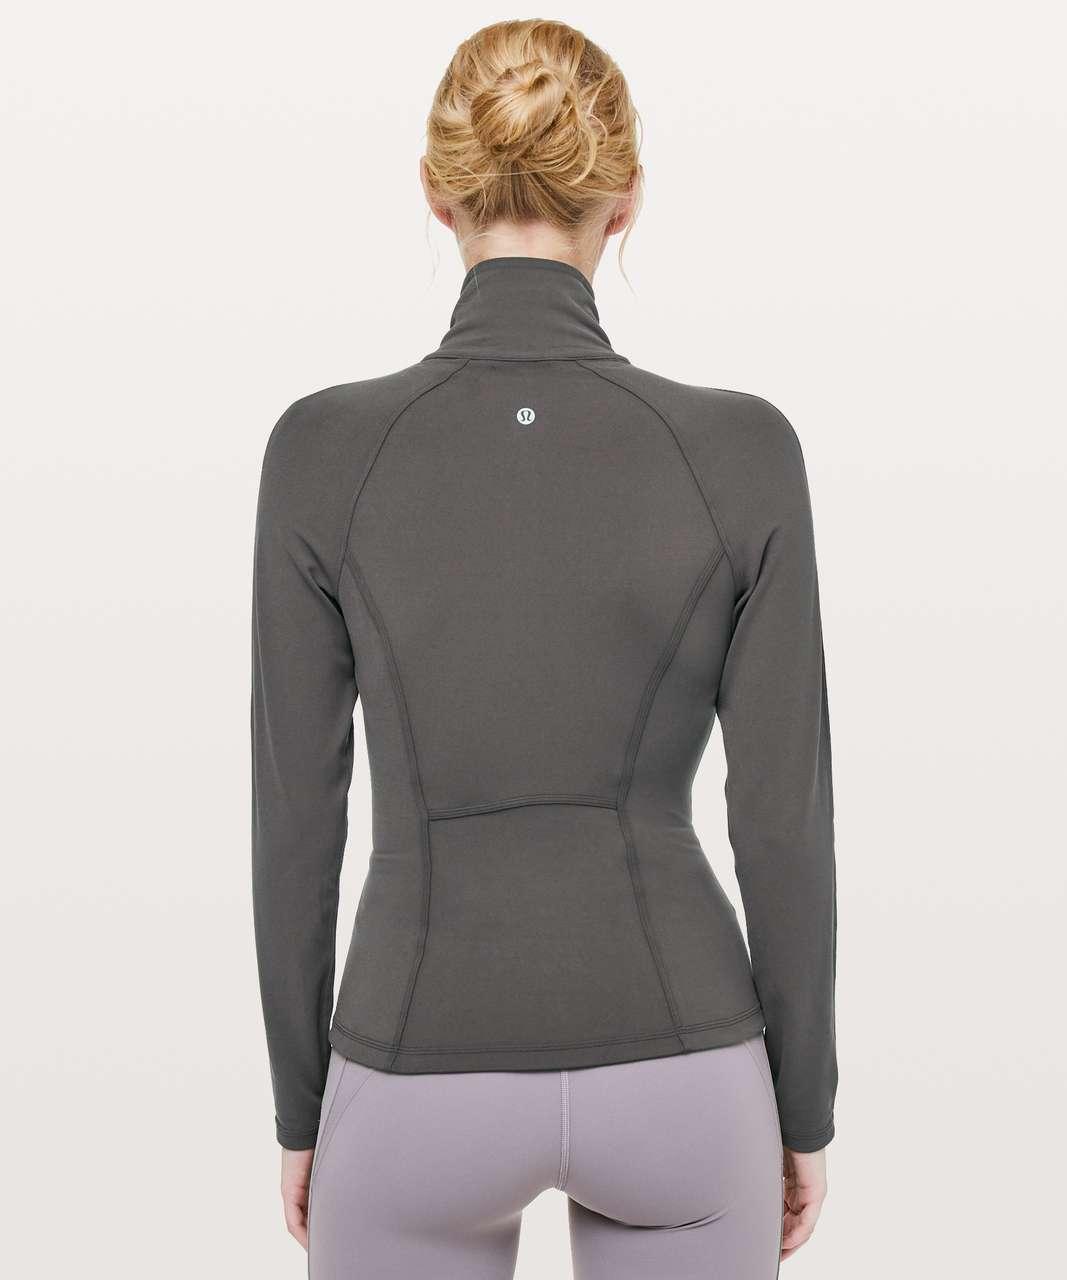 Lululemon Principal Dancer Corsetry Jacket - Soot